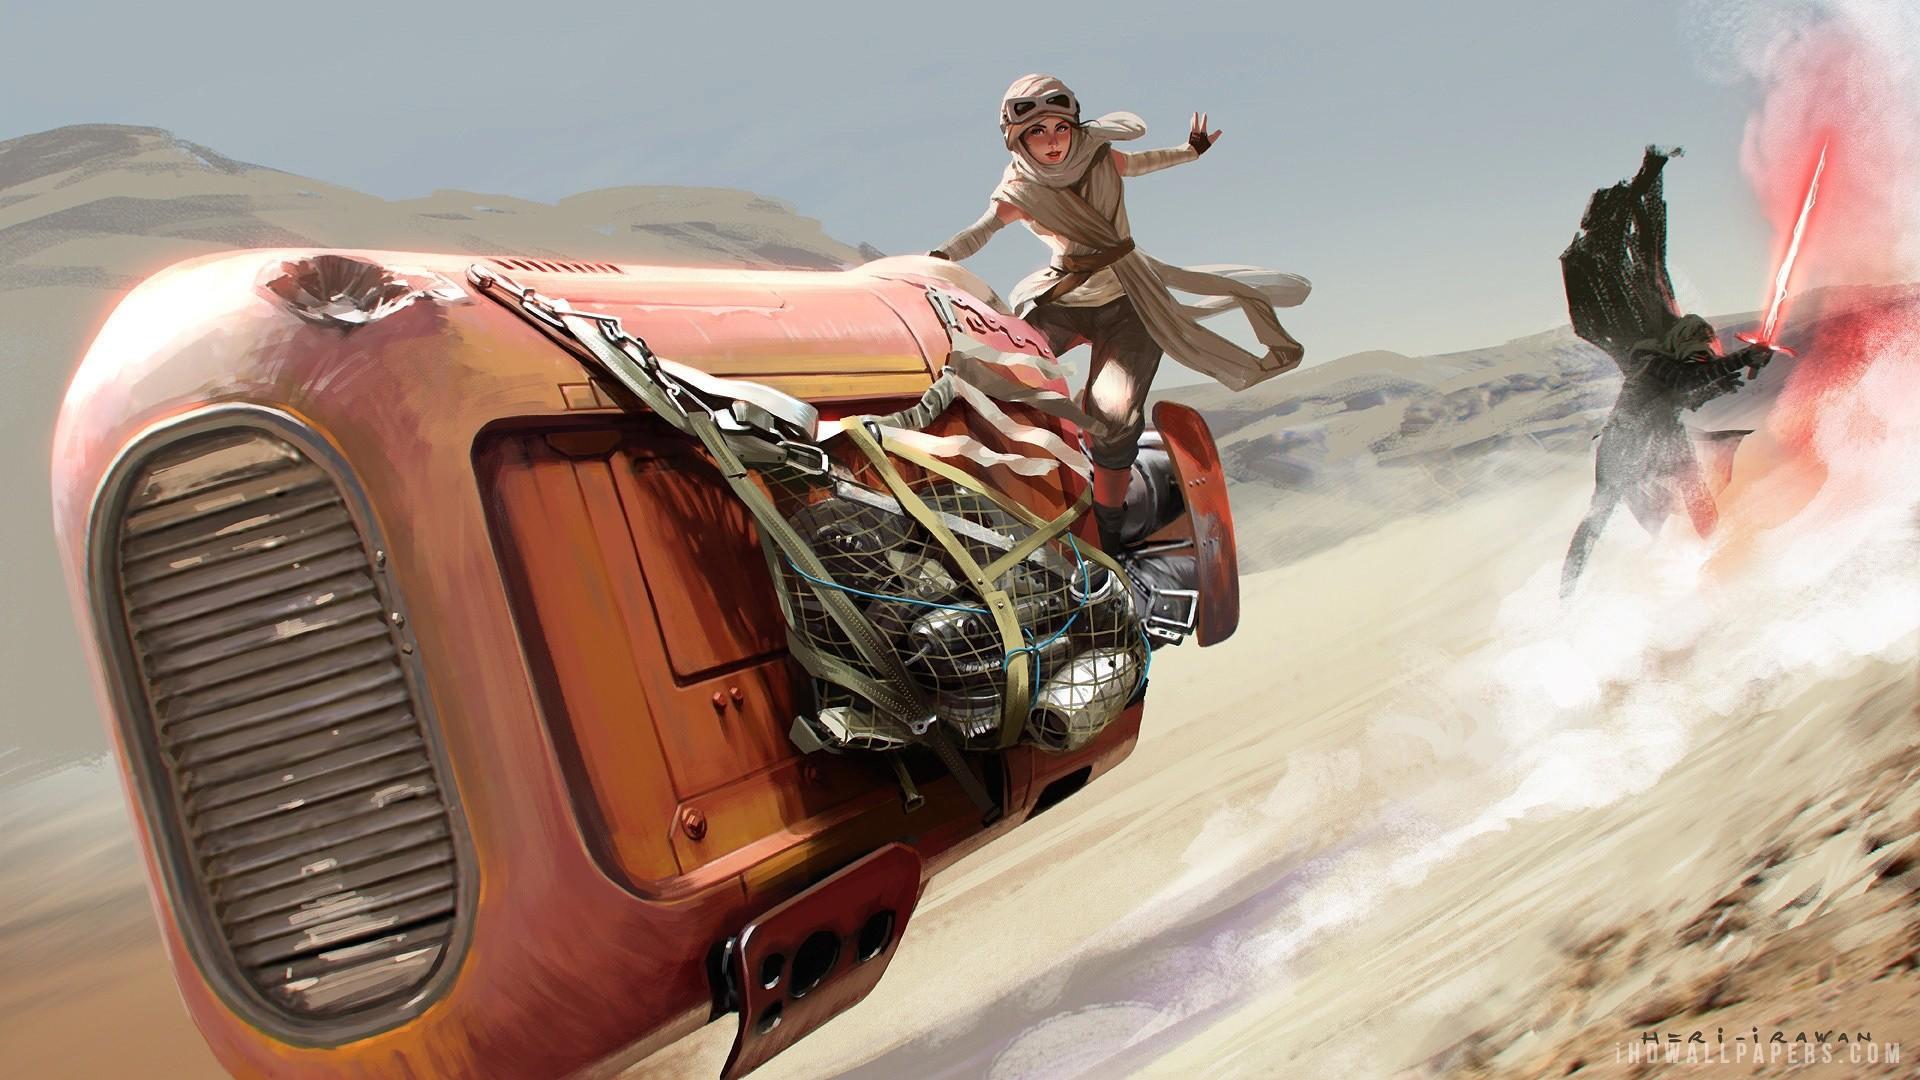 Rey Kylo Ren Star Wars Force Awakens HD Wallpaper – iHD Wallpapers … rey  and bb8 …